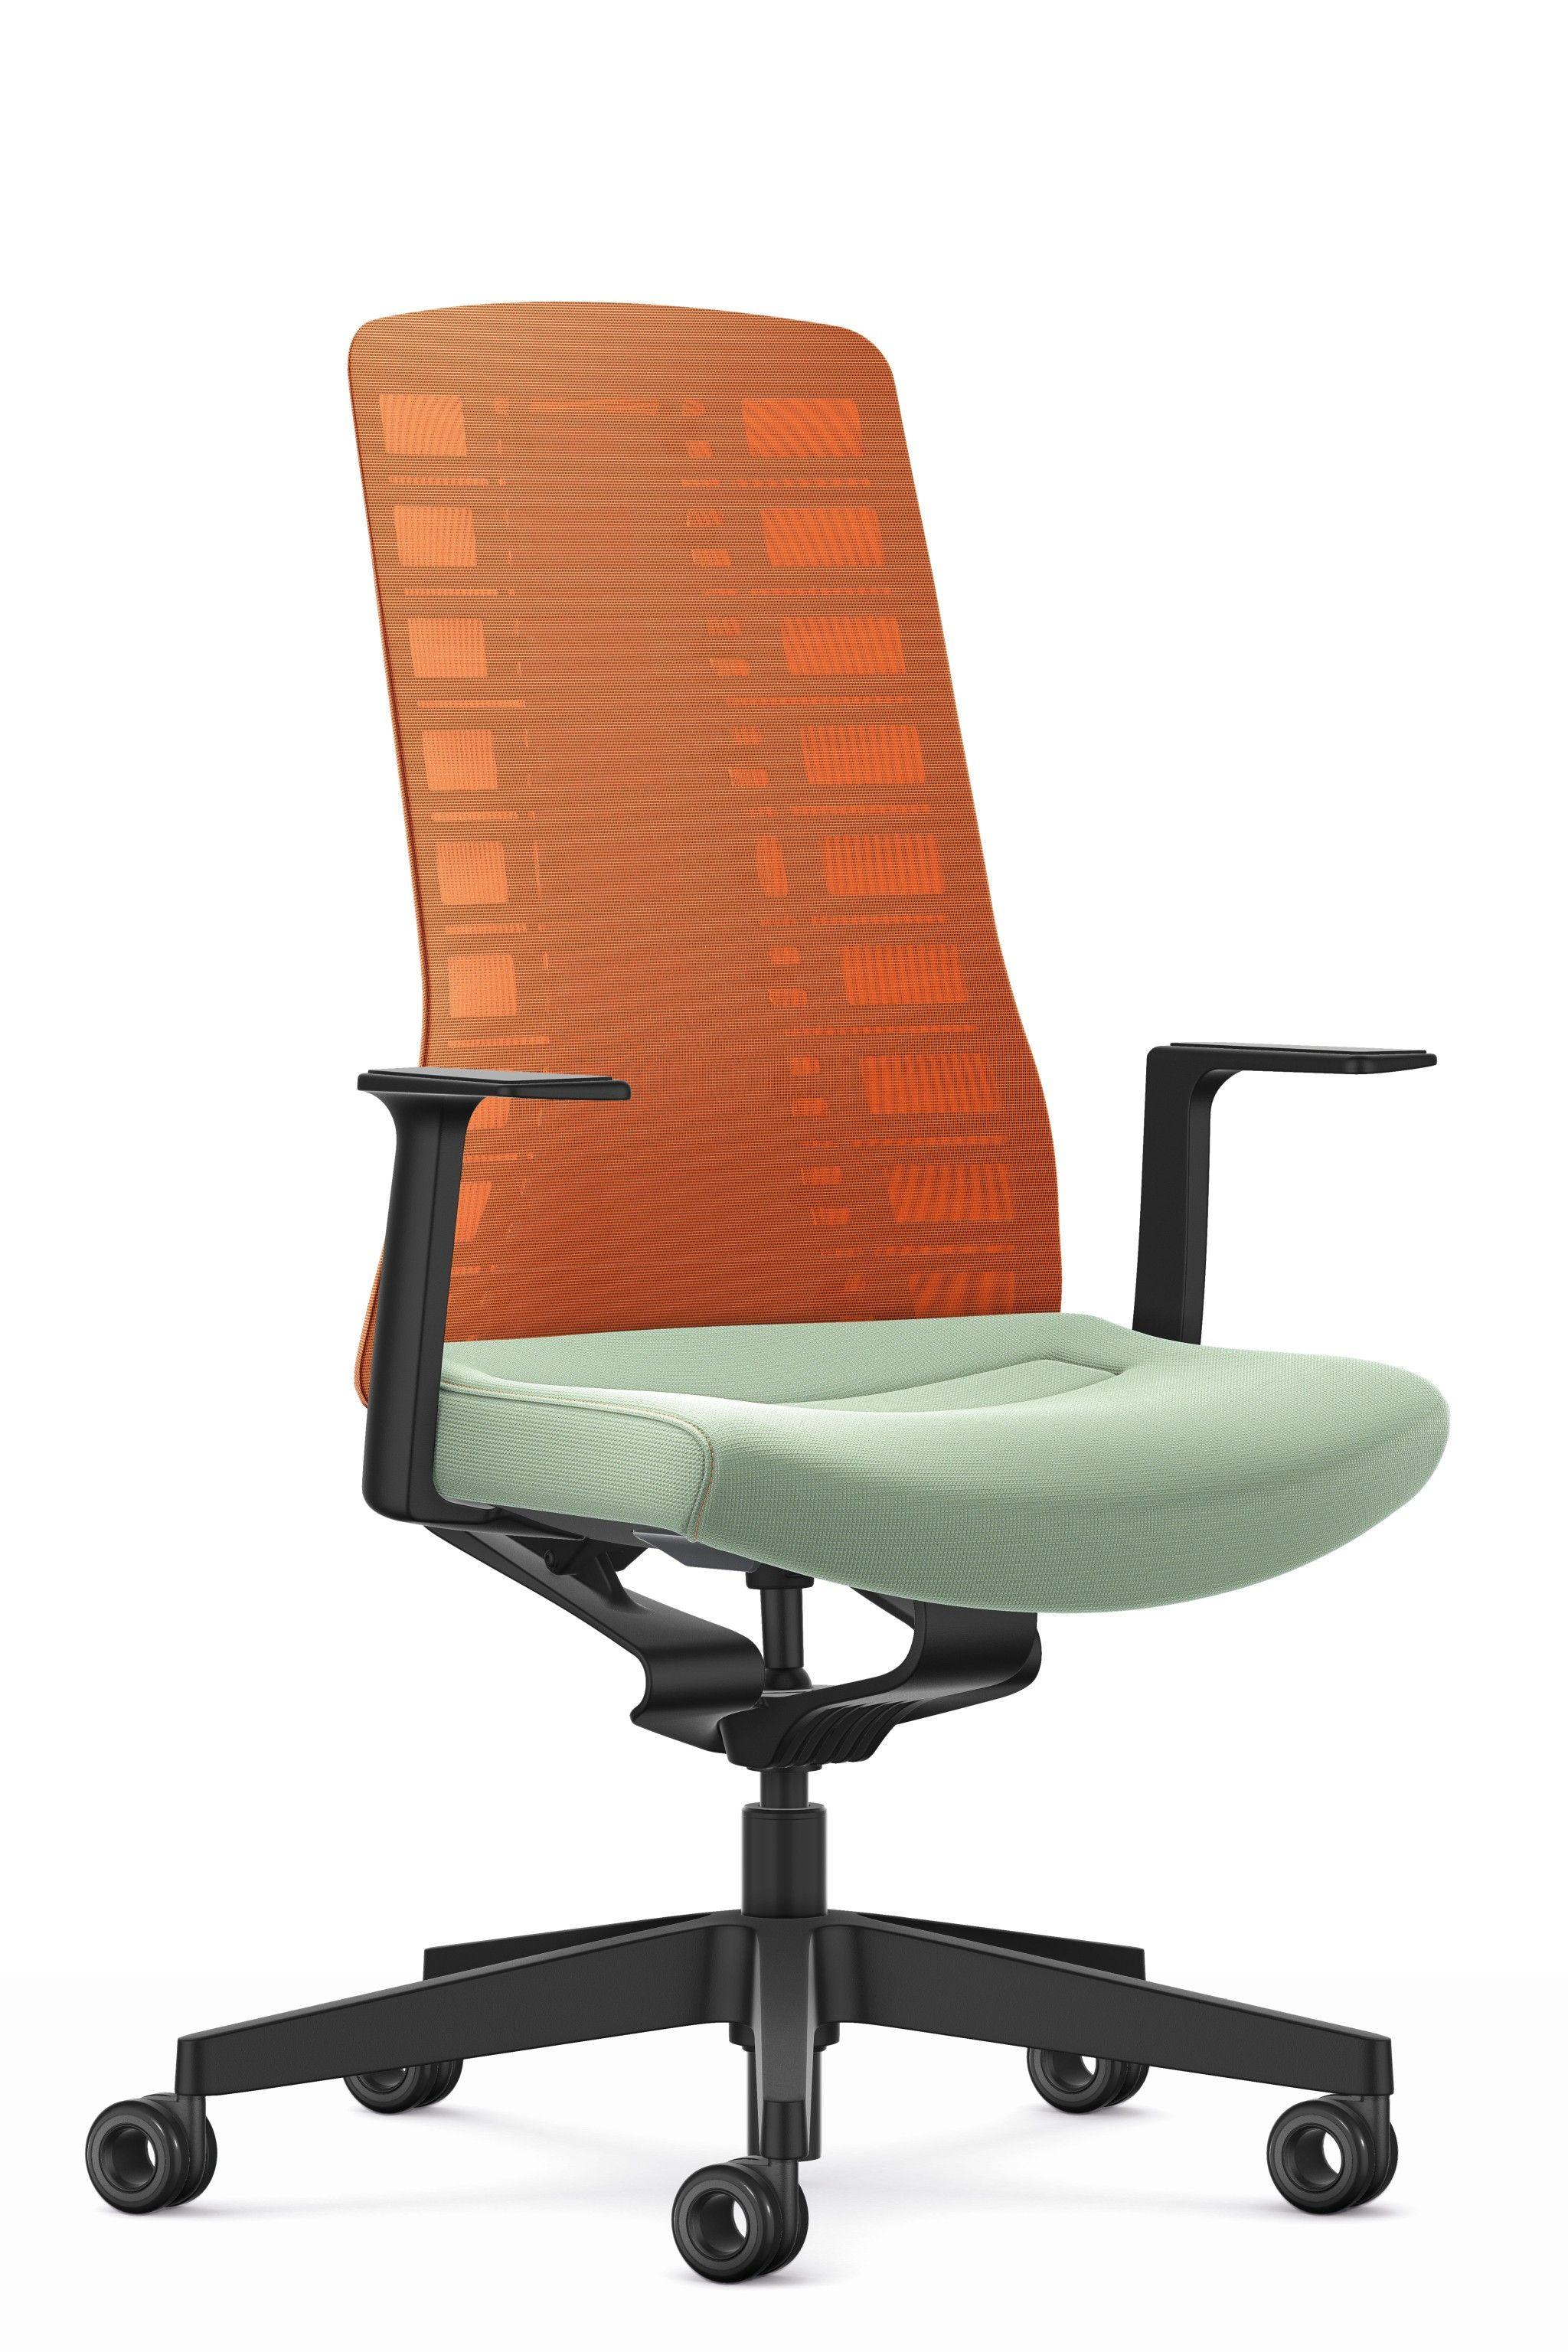 Schreibtischstuhl Orange Mint Pure Active Edition Burostuhl Von Interstuhl Burostuhl Burostuhl Ergonomisch Home Office